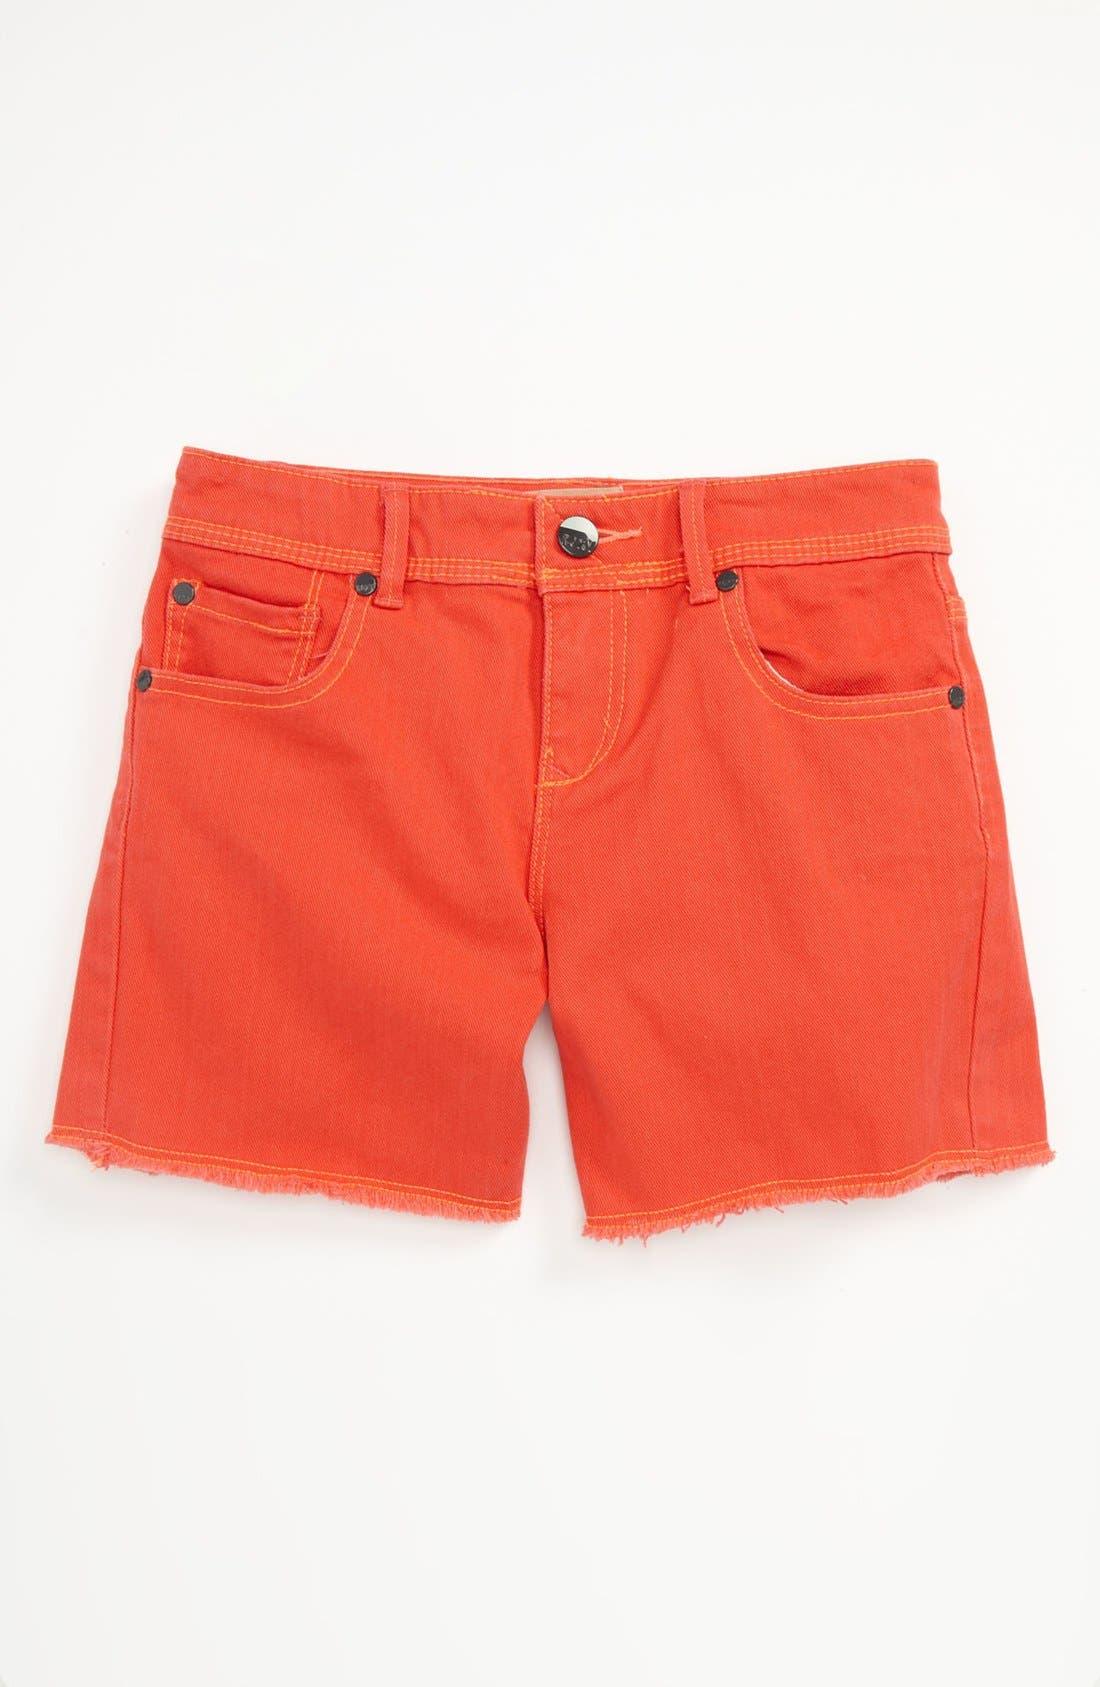 Alternate Image 2  - Roxy 'Long Trippers' Bermuda Shorts (Big Girls)